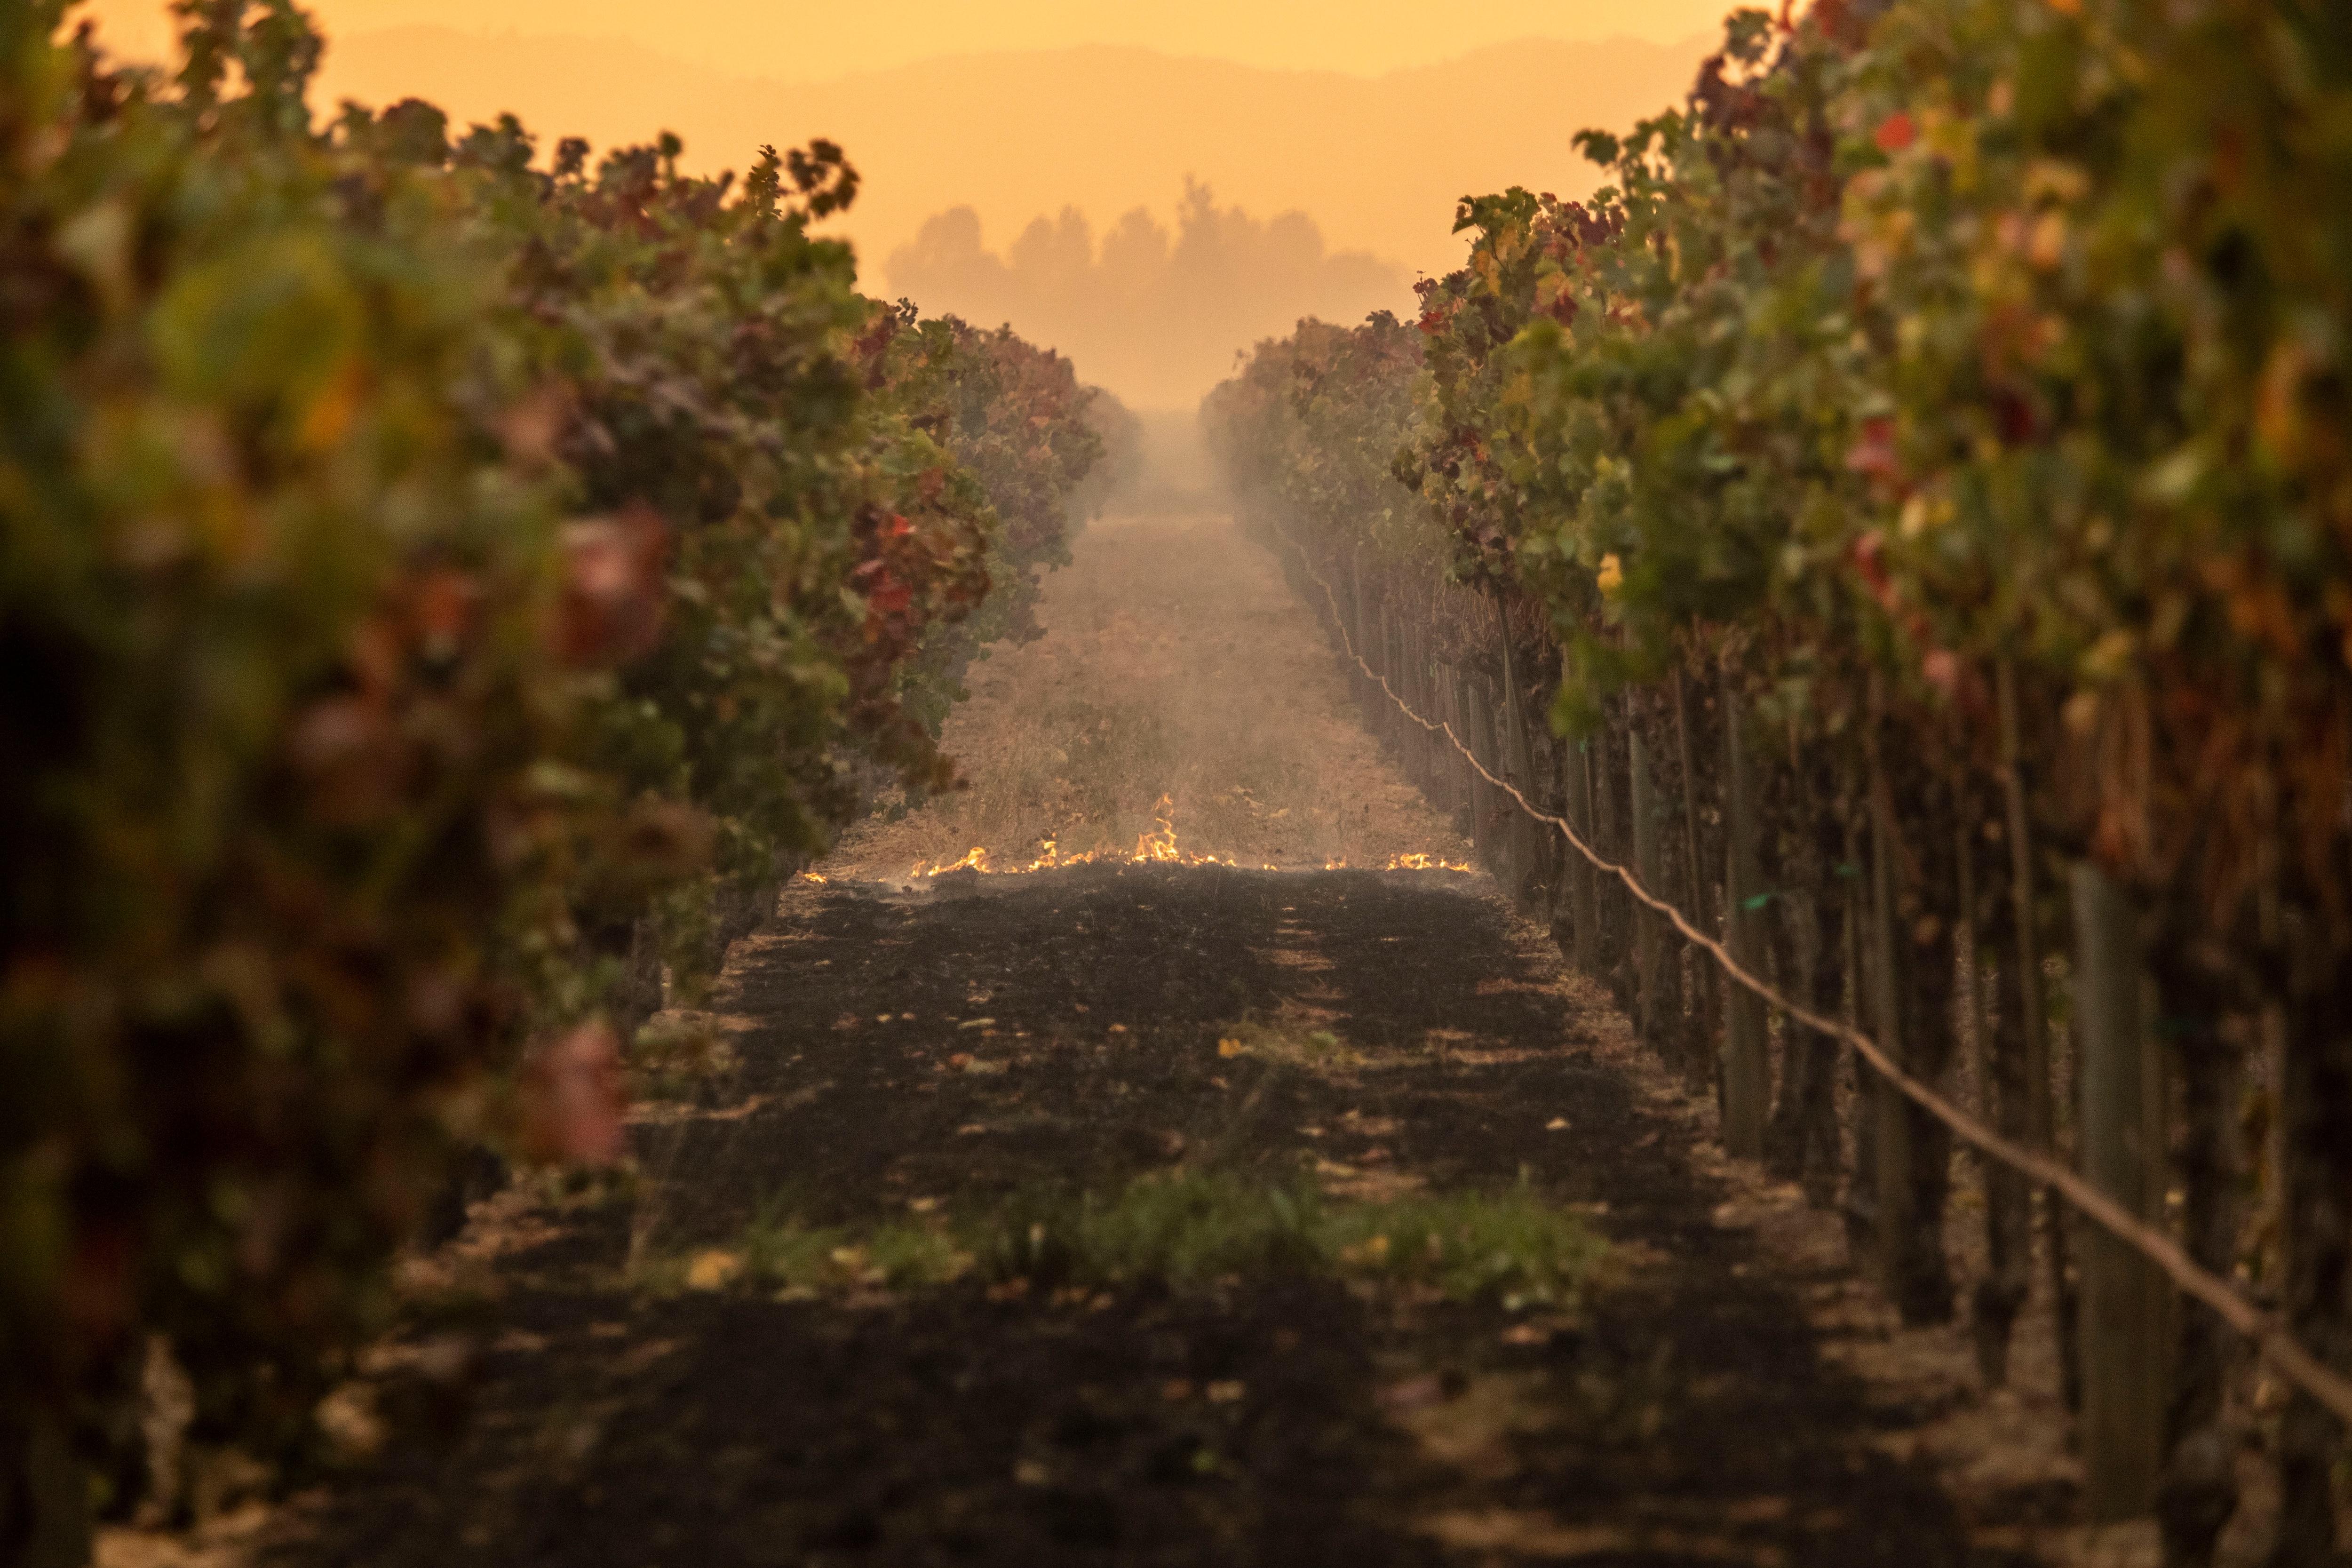 Fire burns gound cover in a vineyard as the Kincade Fire burned through the area near Geyserville, California.